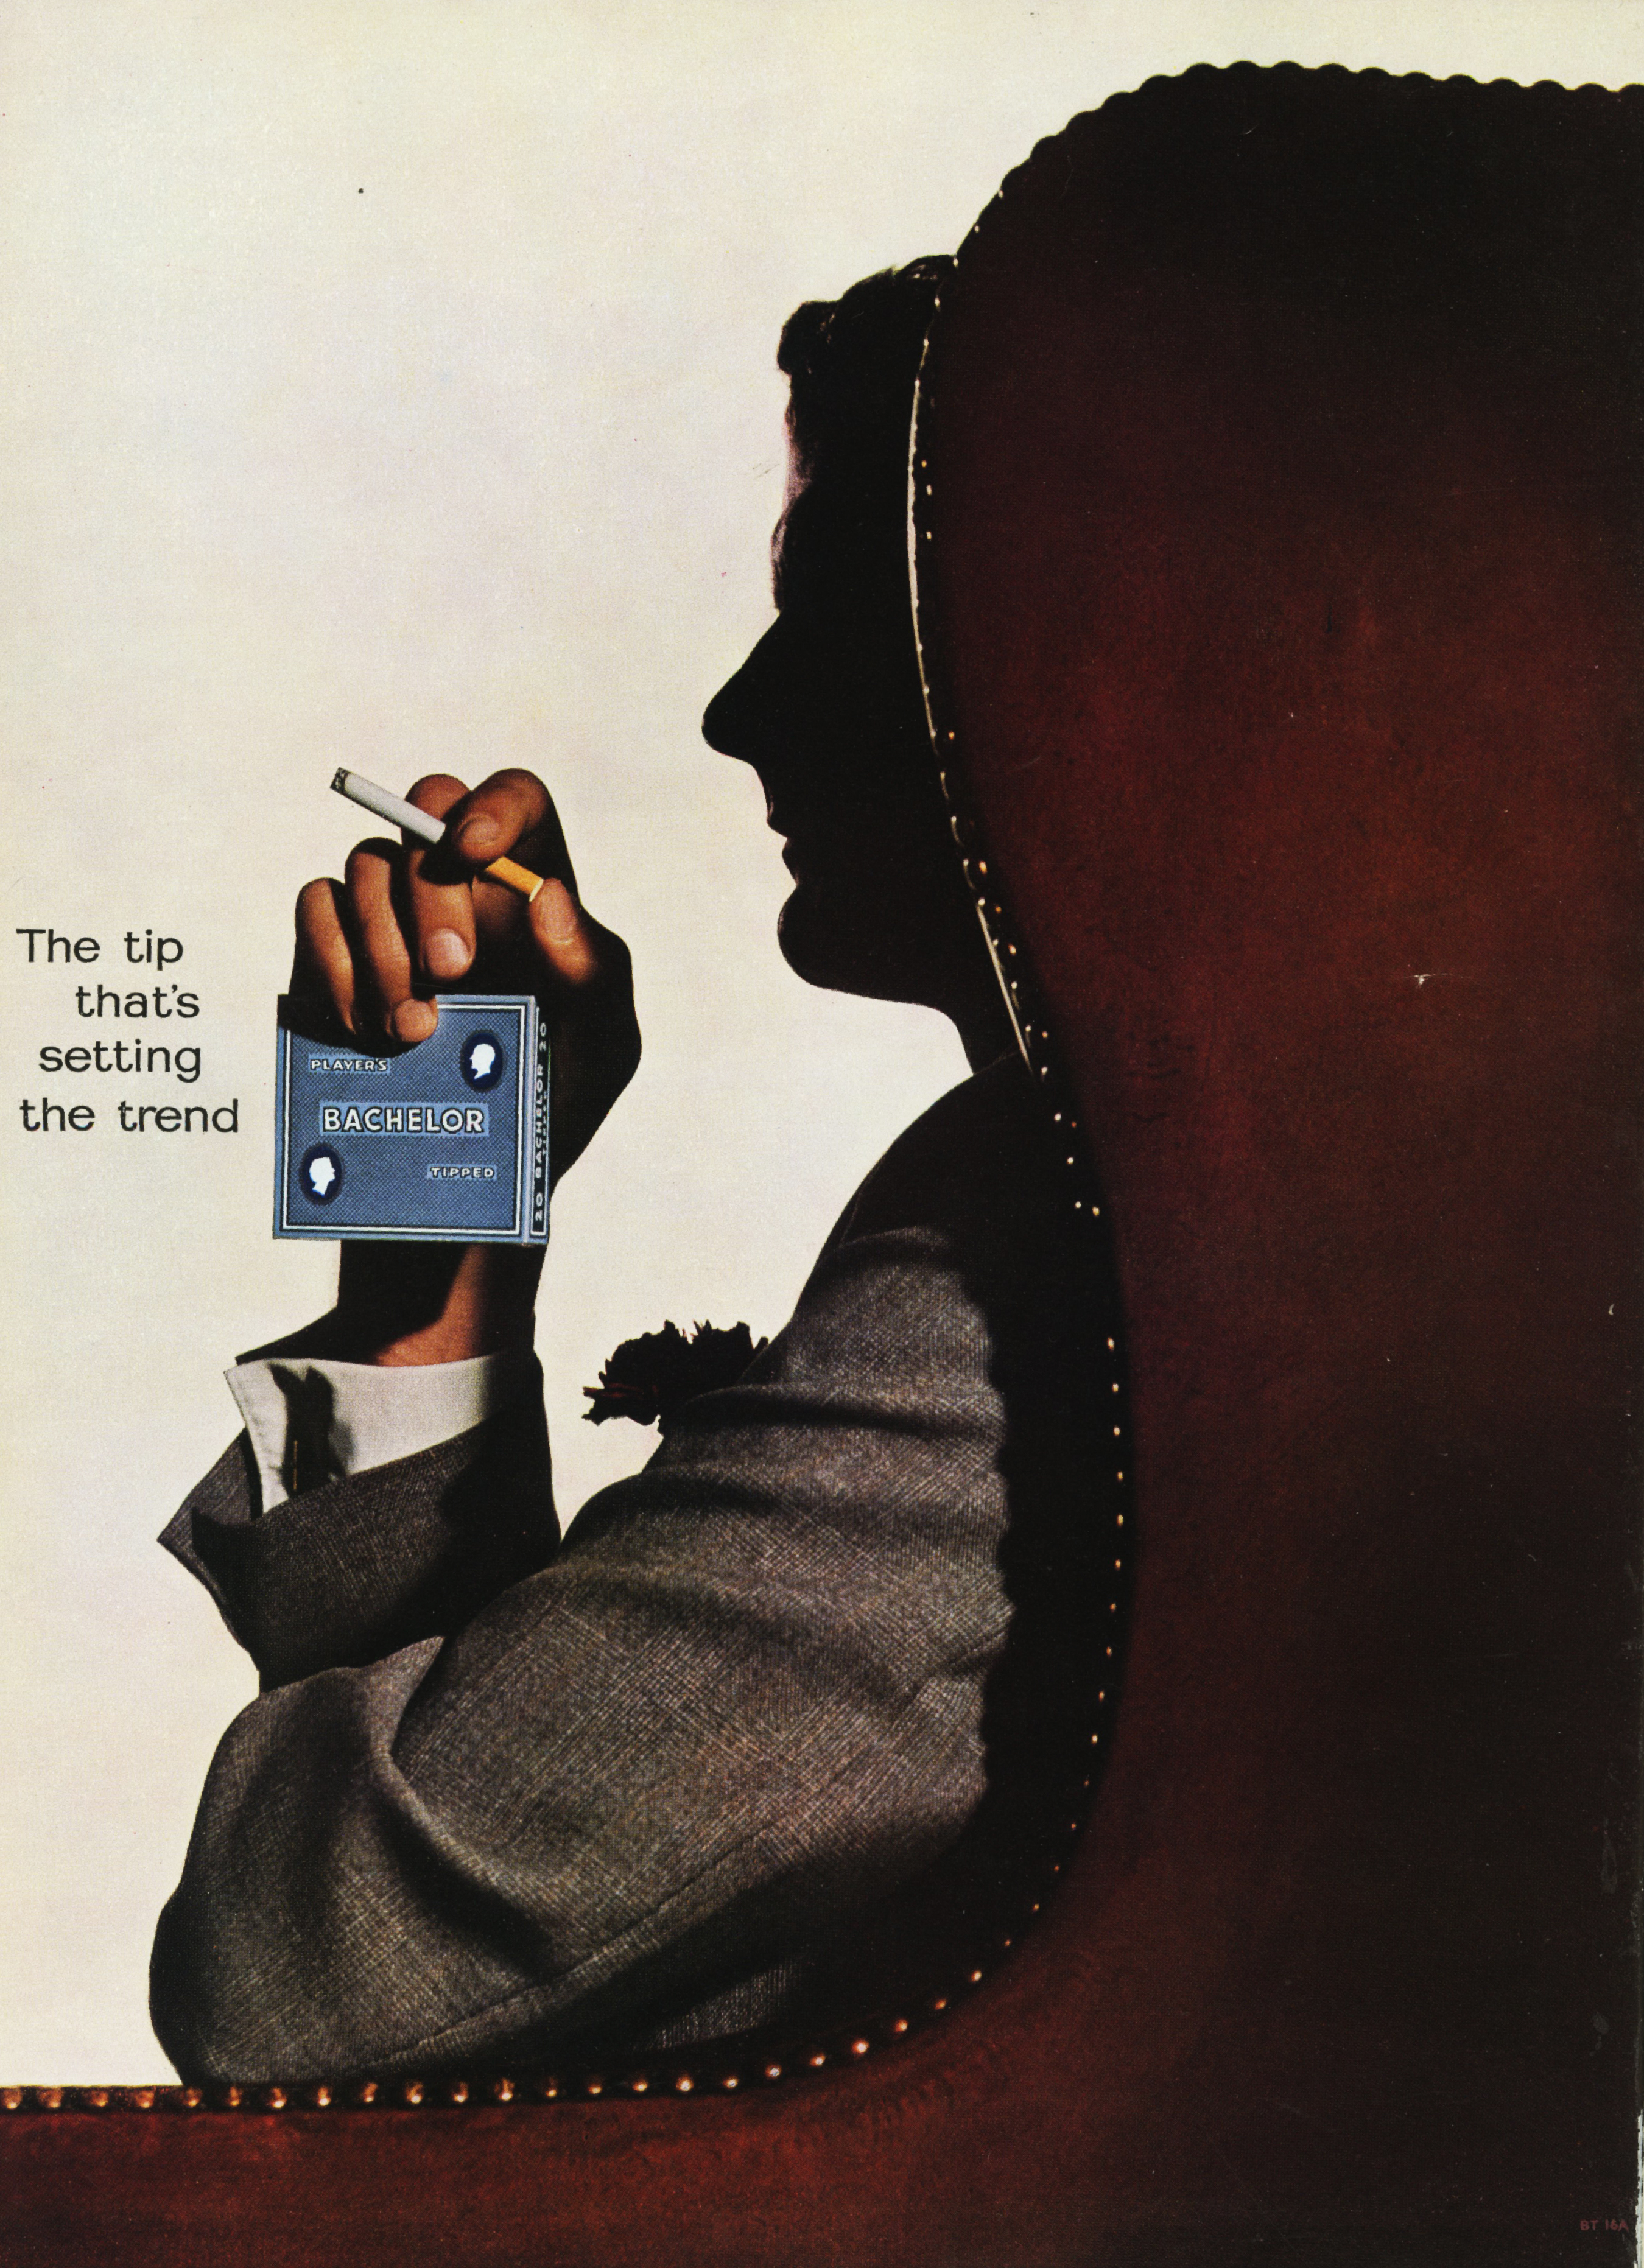 Lester Bookbinder, Bachelors Cigarettes - 'Arm Chair'-01